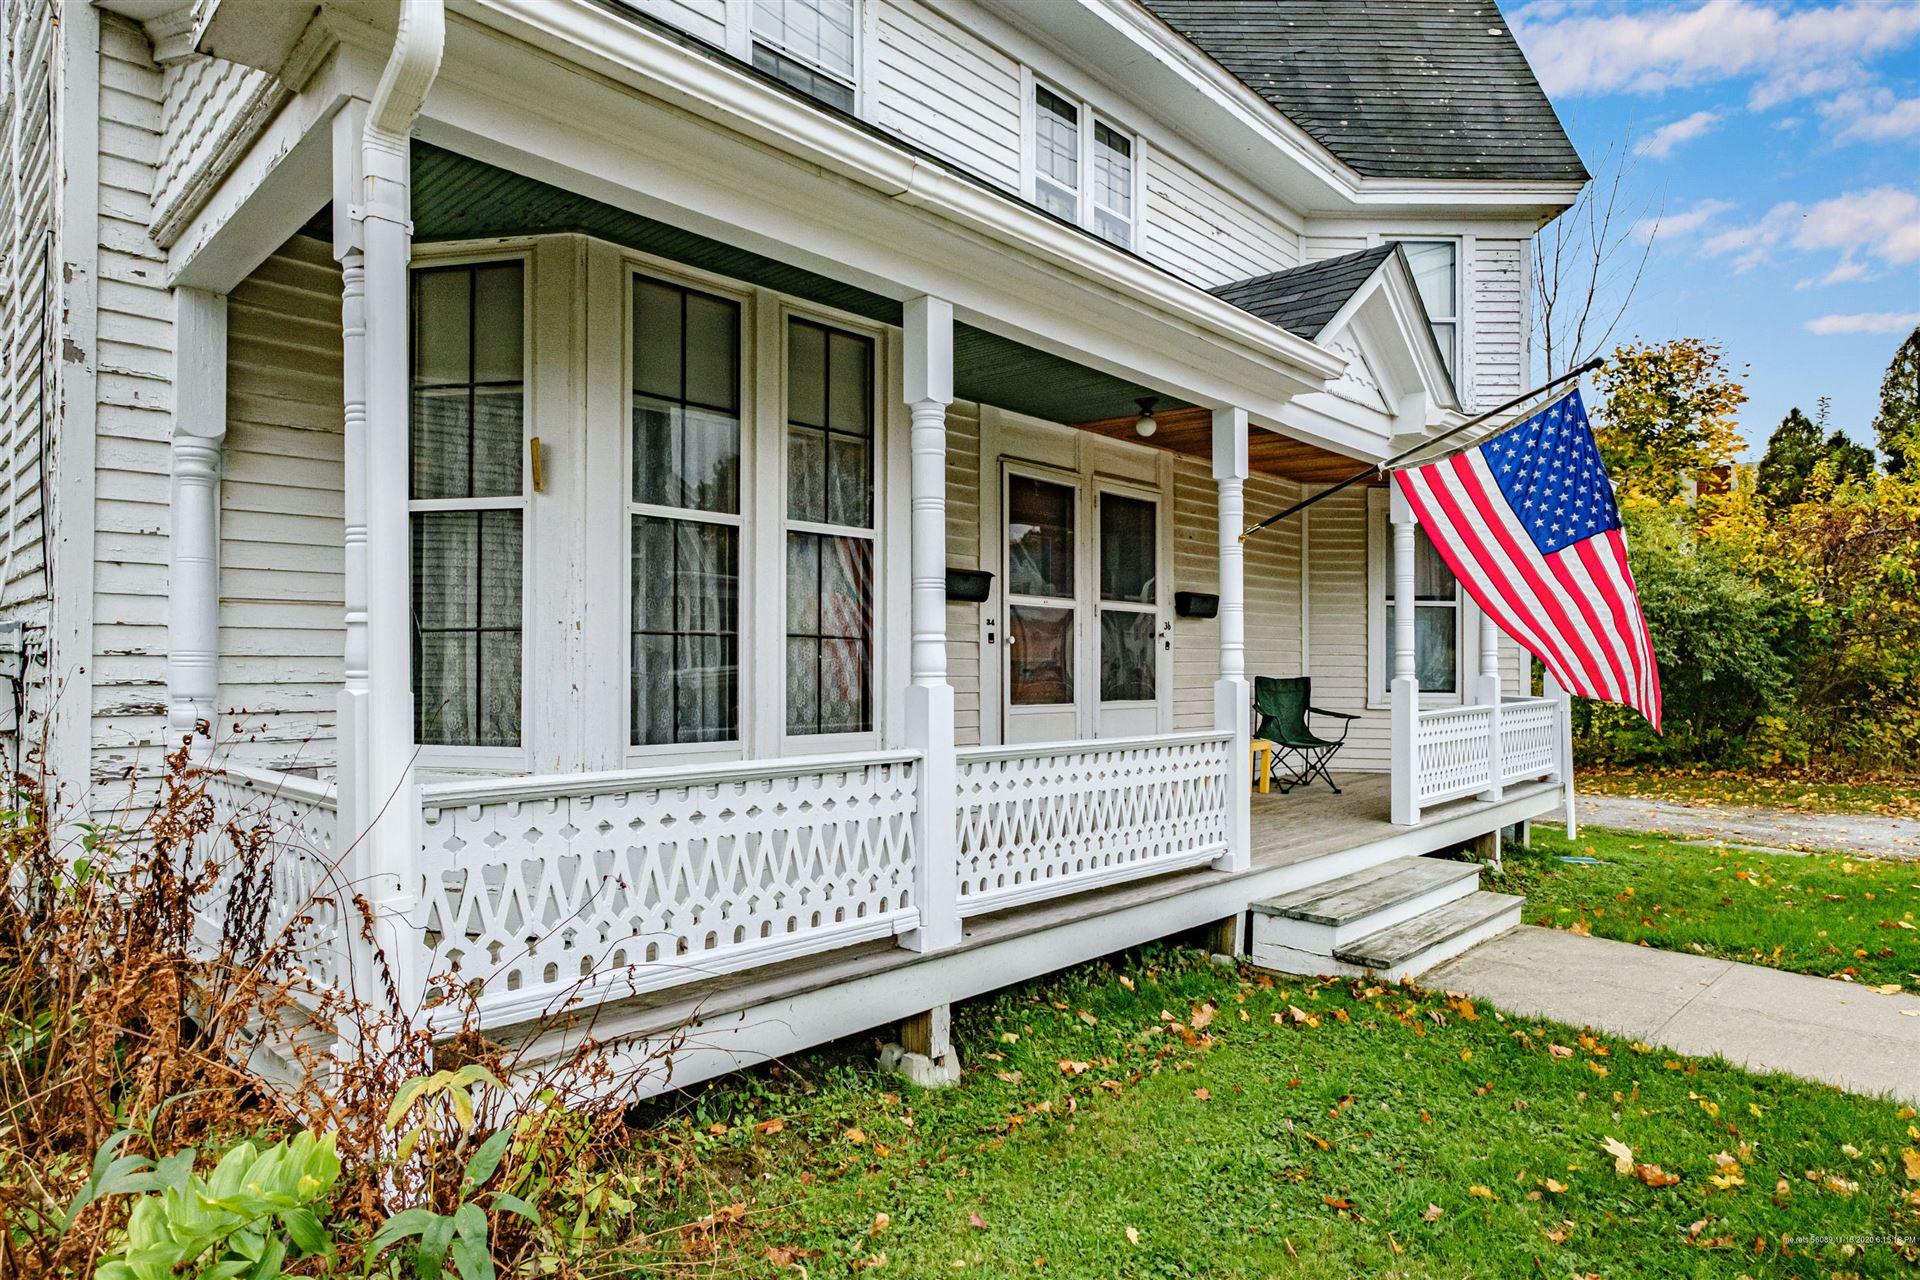 Photo of 34-36 Masonic Street, Rockland, ME 04841 (MLS # 1473940)